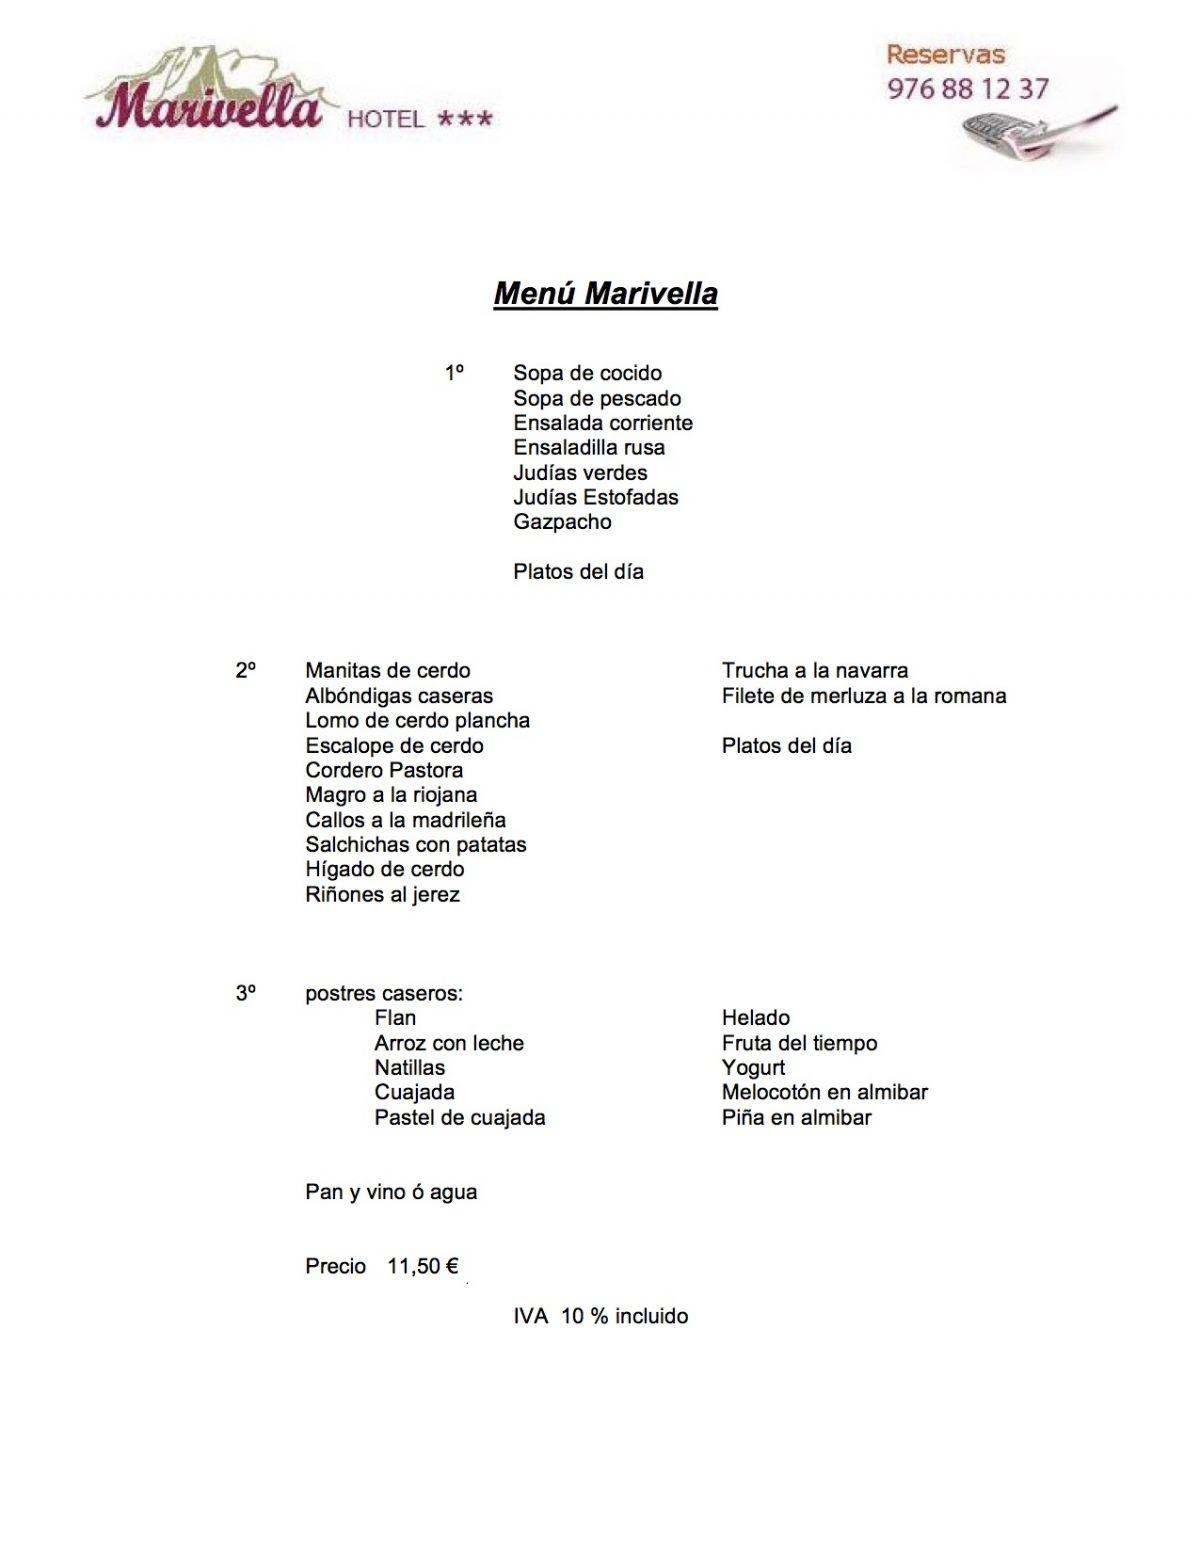 menu-marivella-agosto-2015-1200x1553.jpg